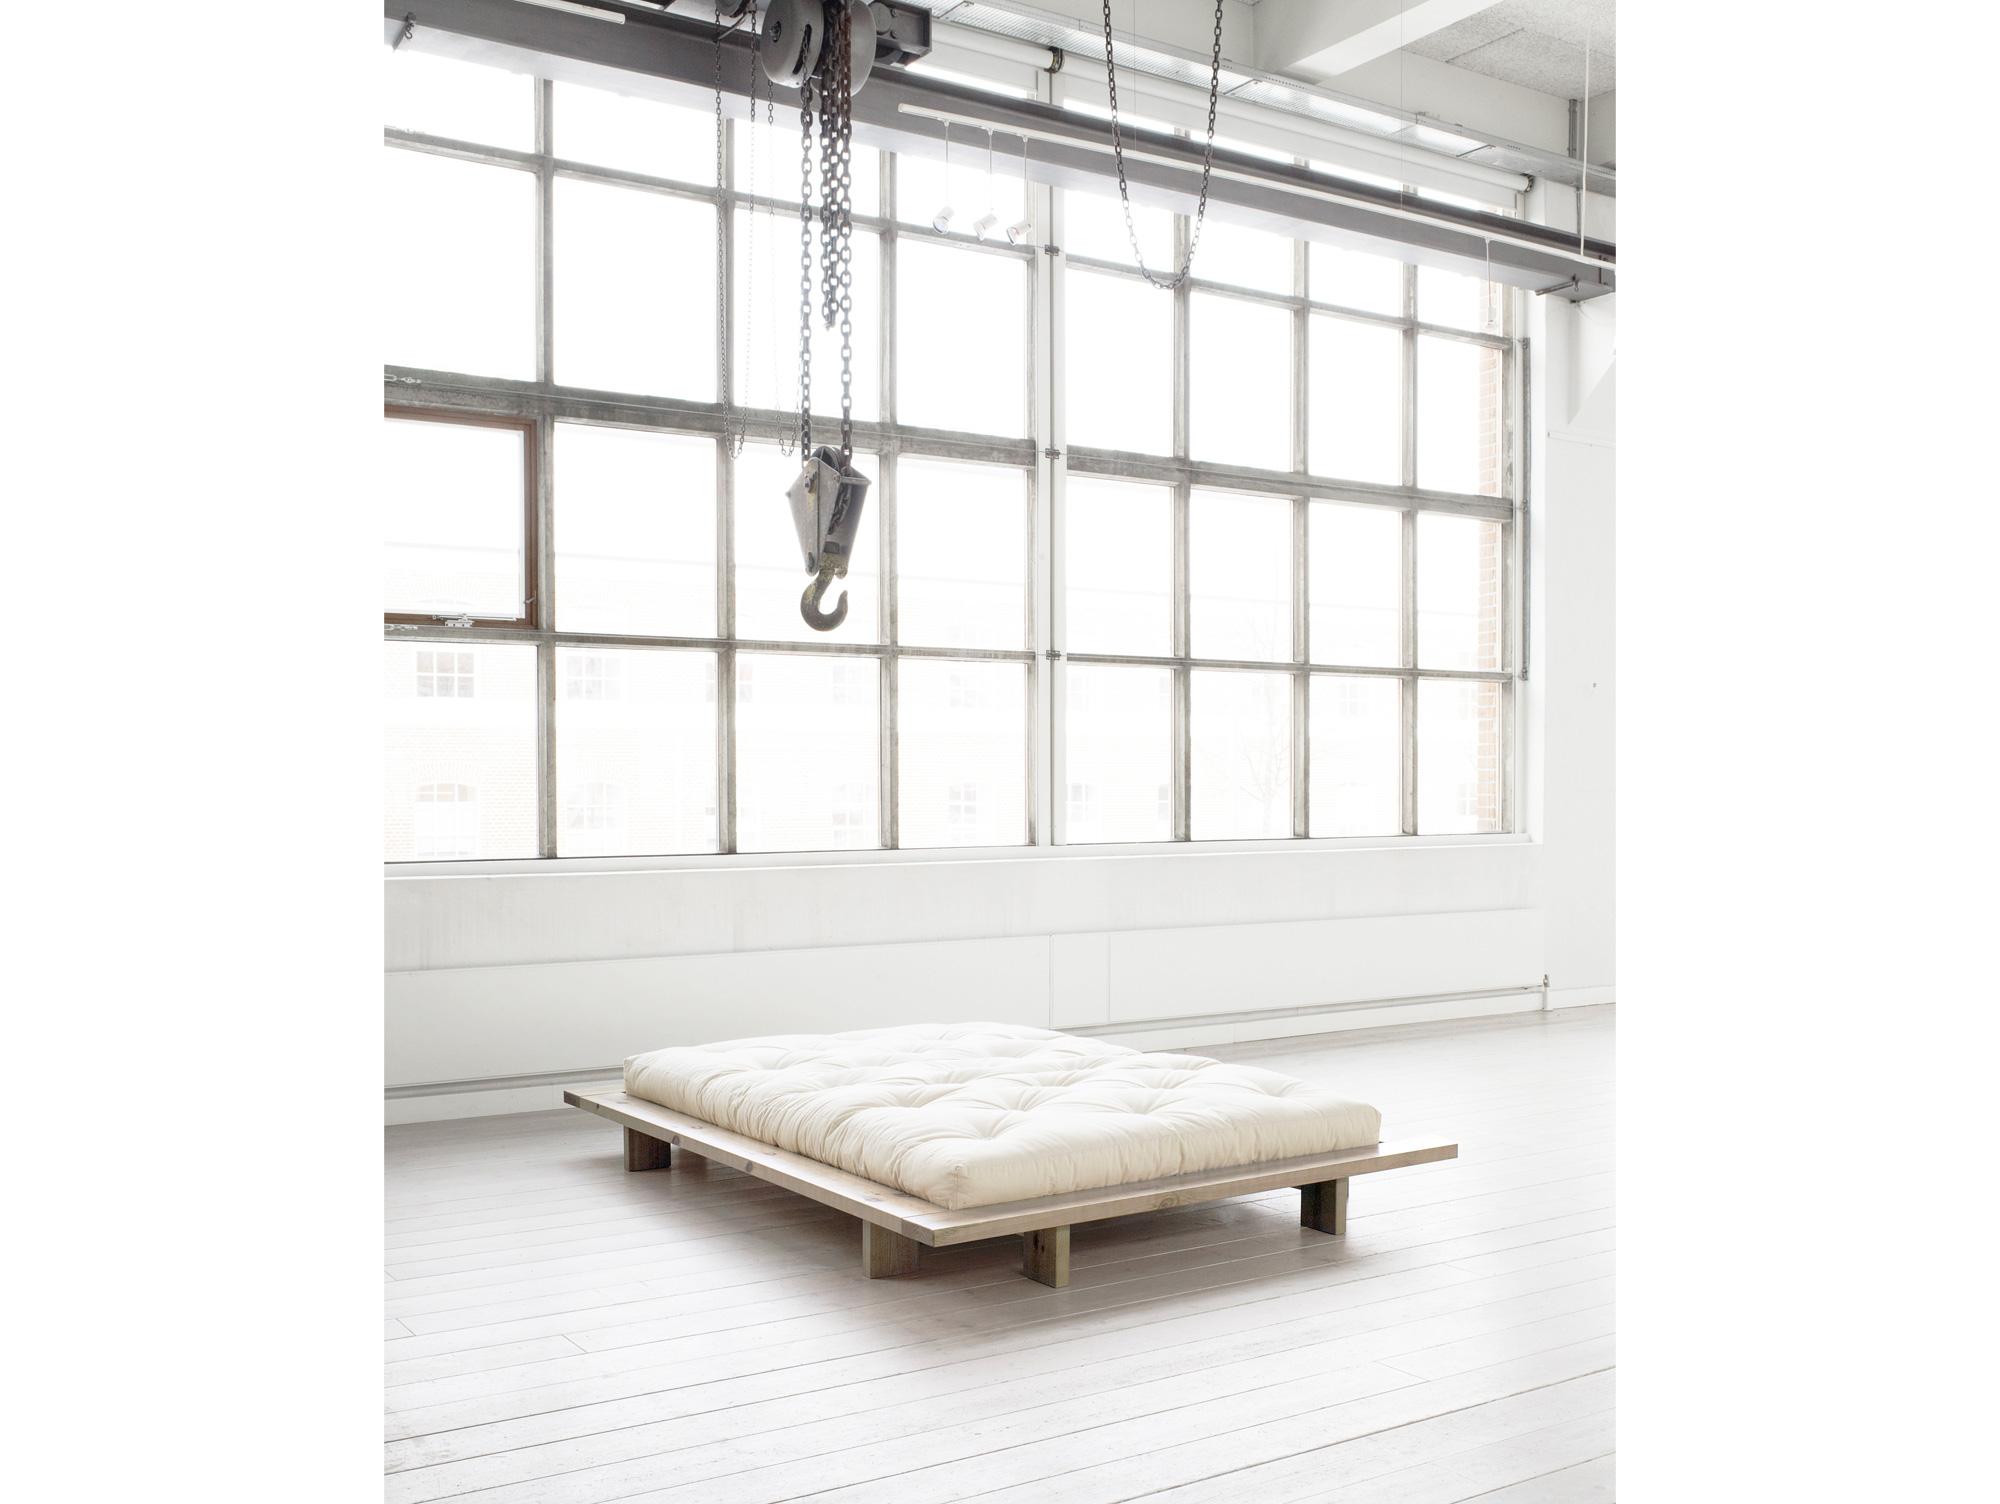 jani bett kiefer massiv 140 x 200 cm natur. Black Bedroom Furniture Sets. Home Design Ideas